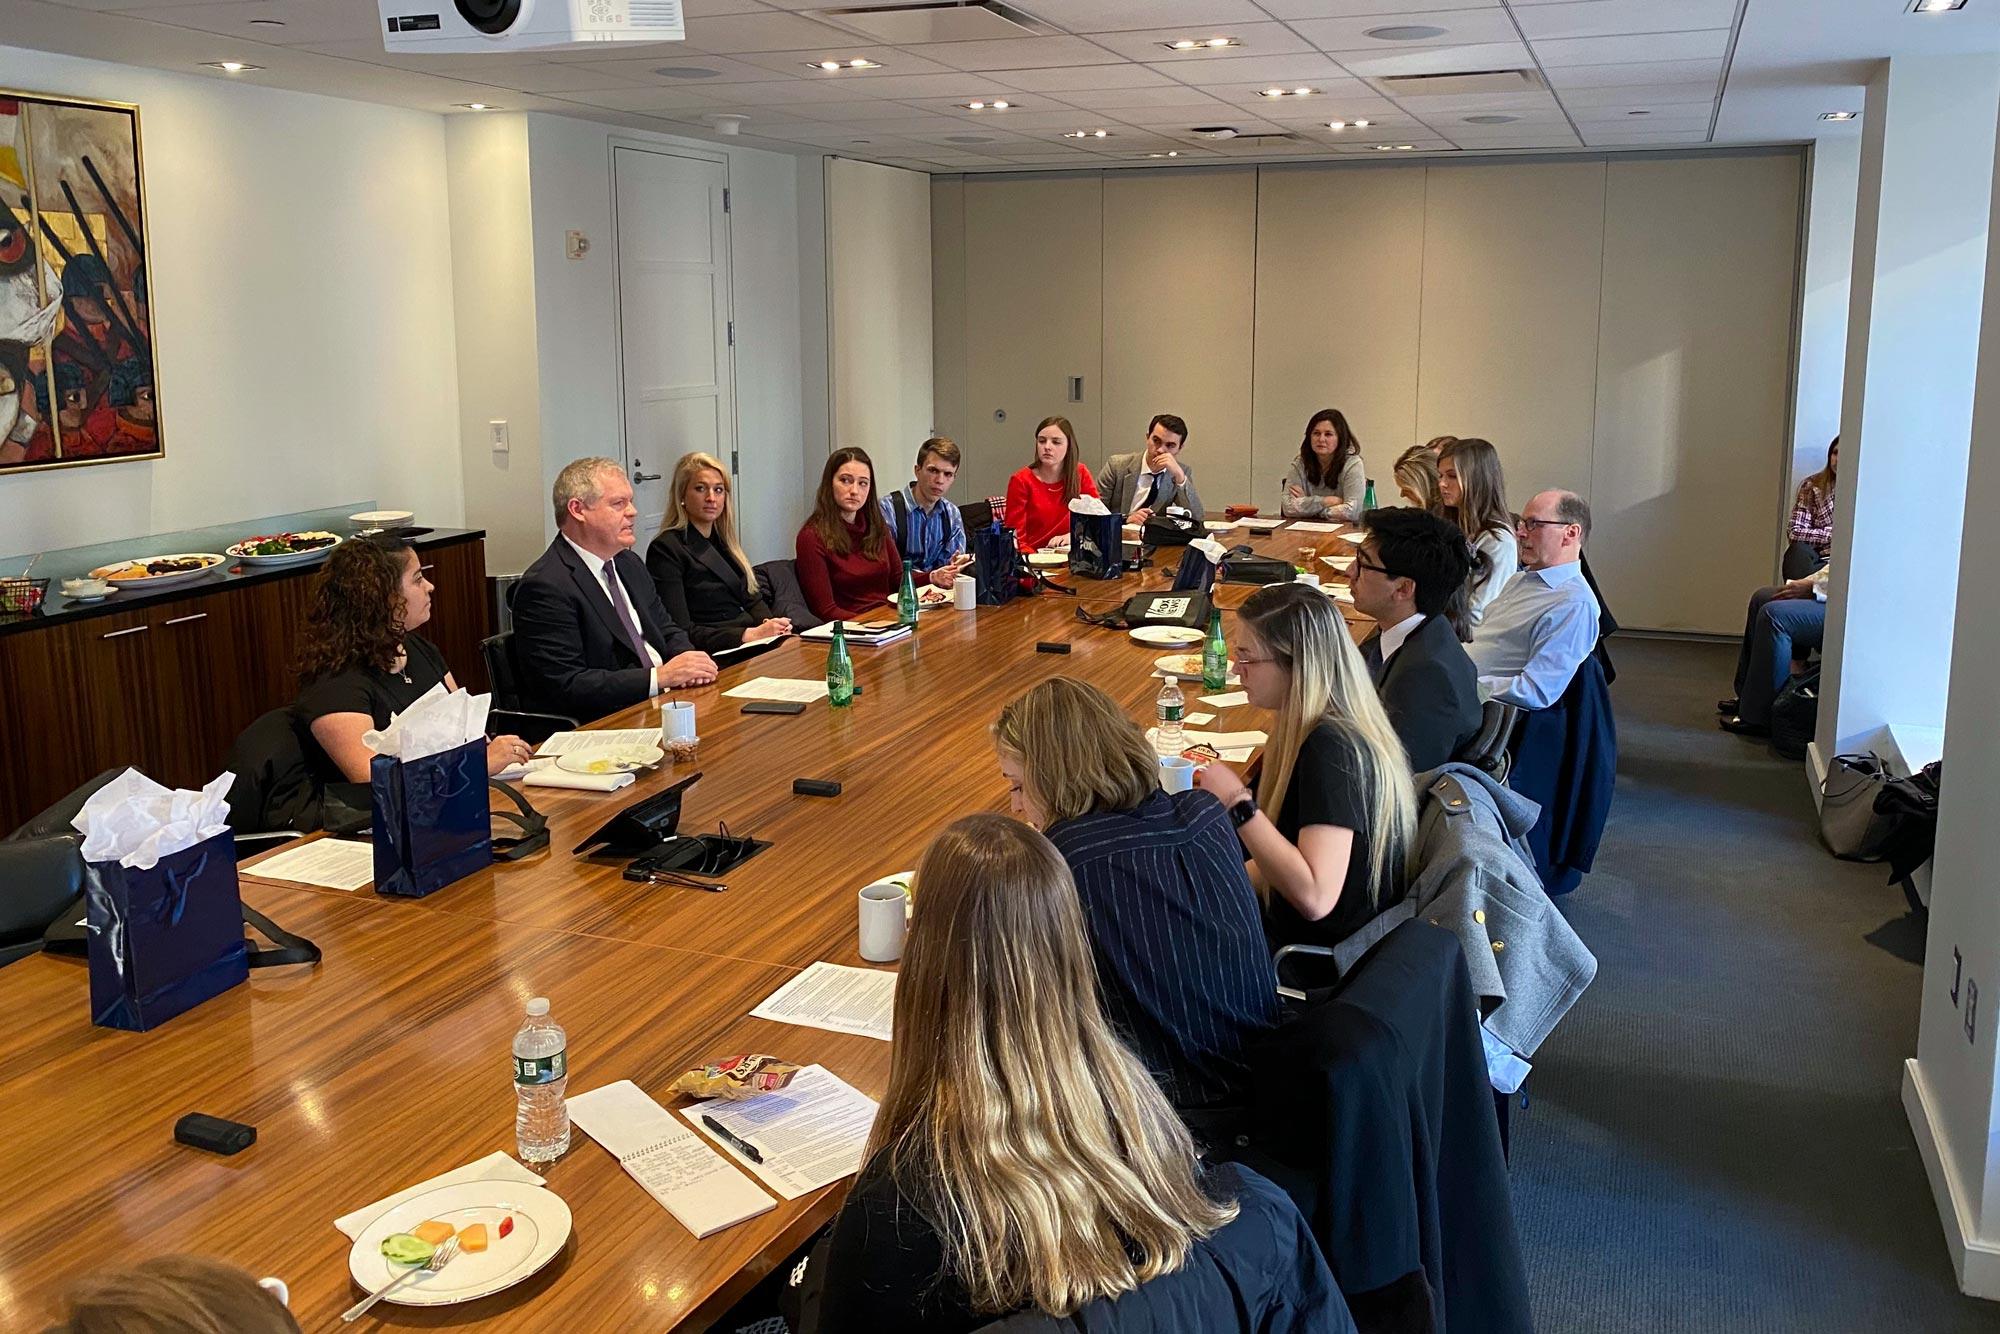 Students at a Fox News meeting.